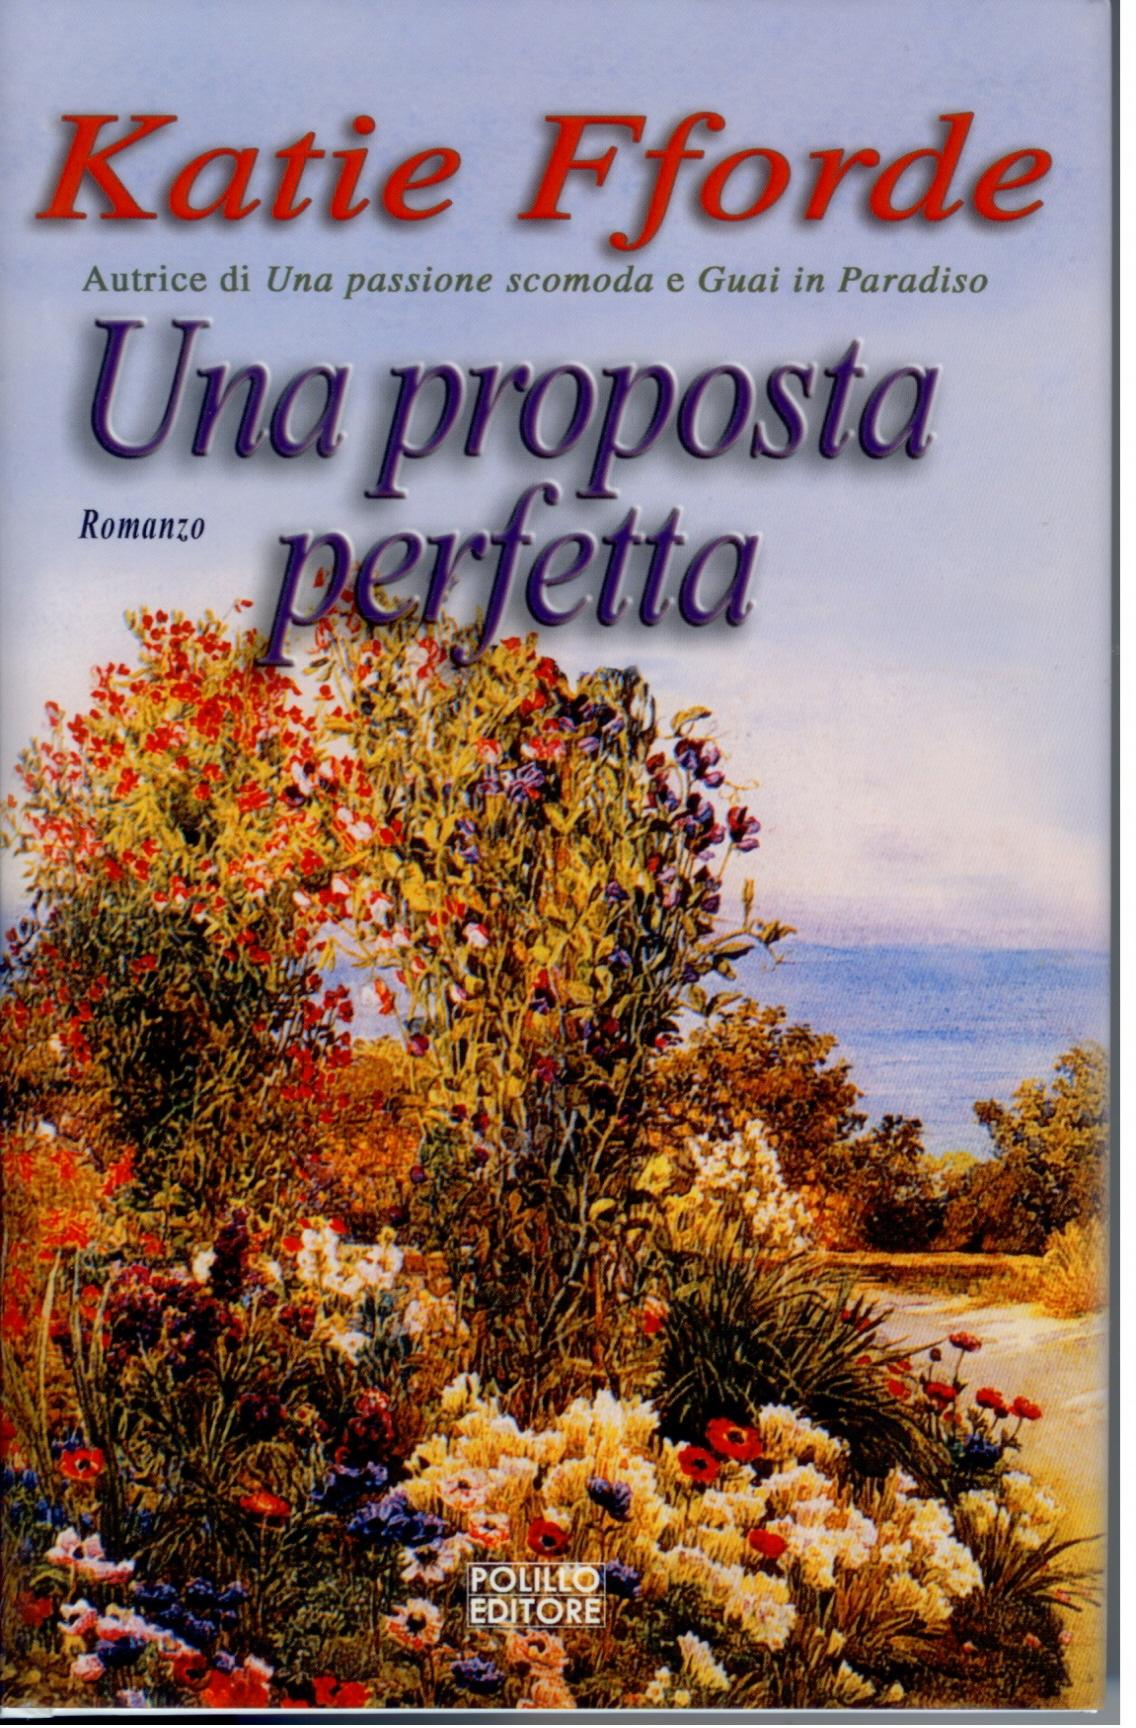 Una proposta perfetta